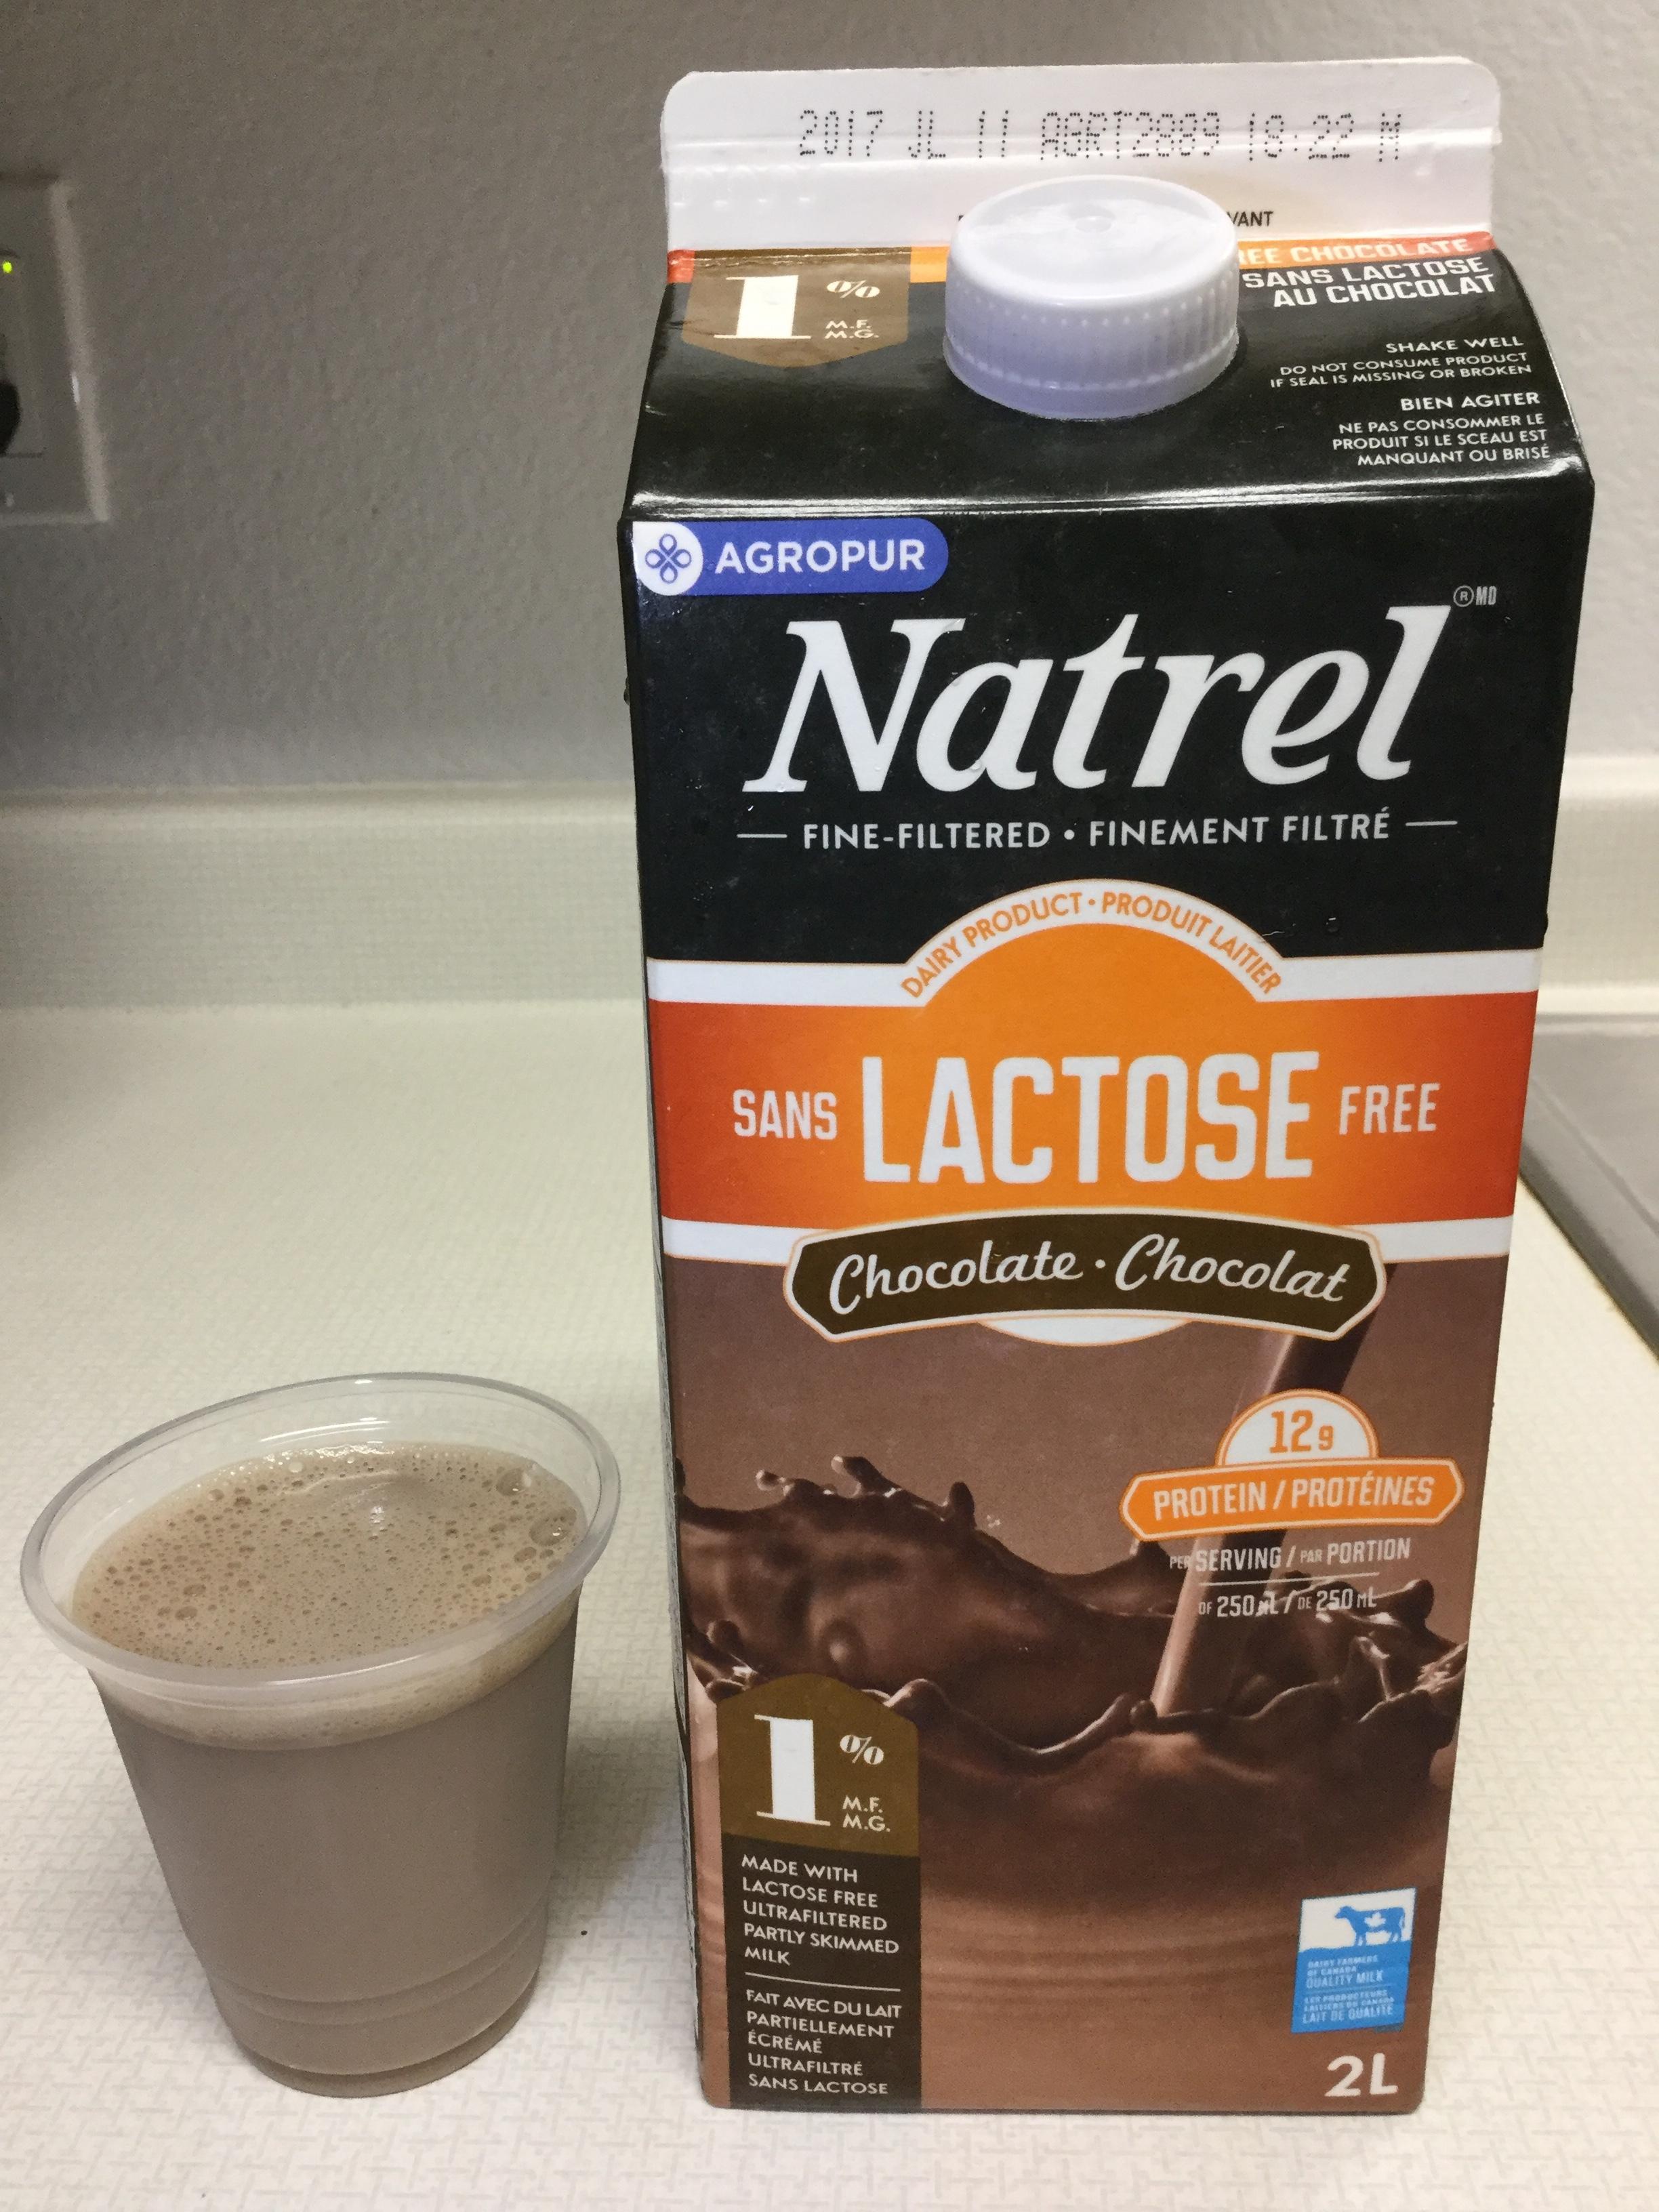 Natrel Lactose Free Chocolate Milk Cup